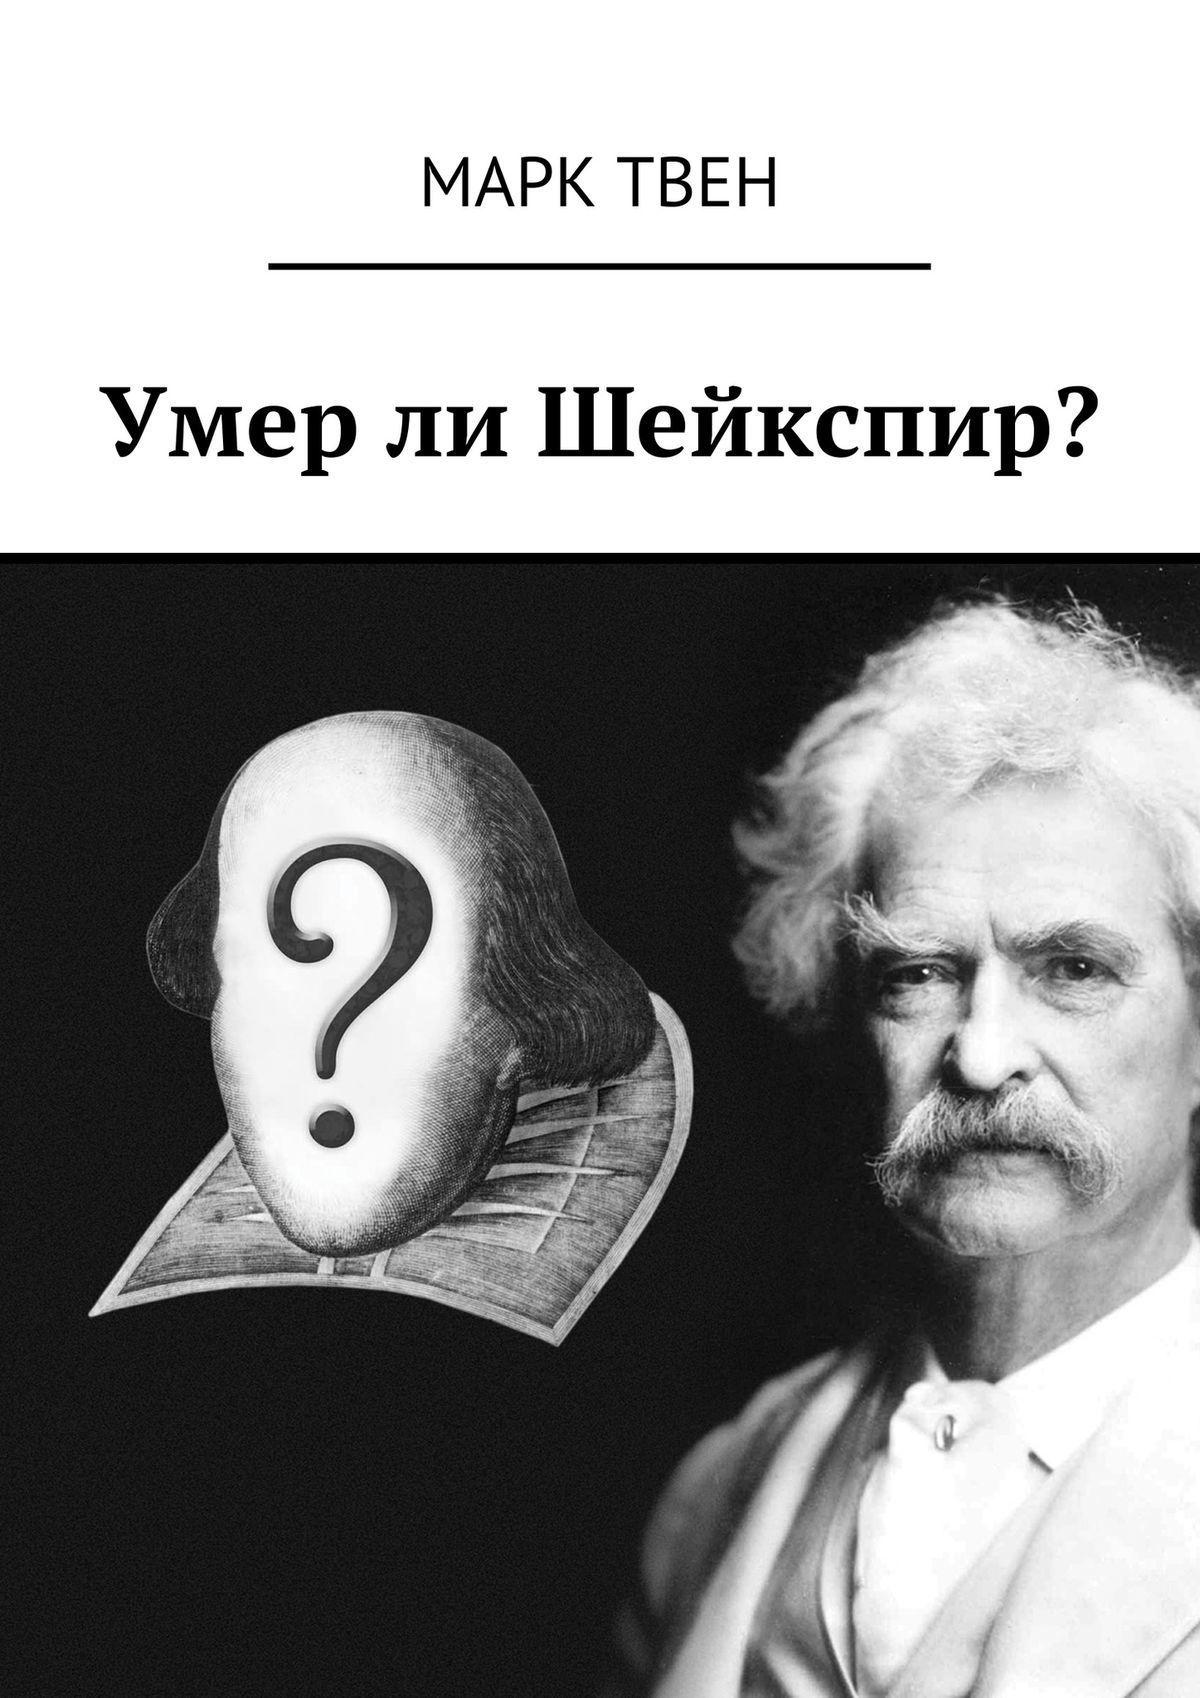 Умерли Шейкспир?